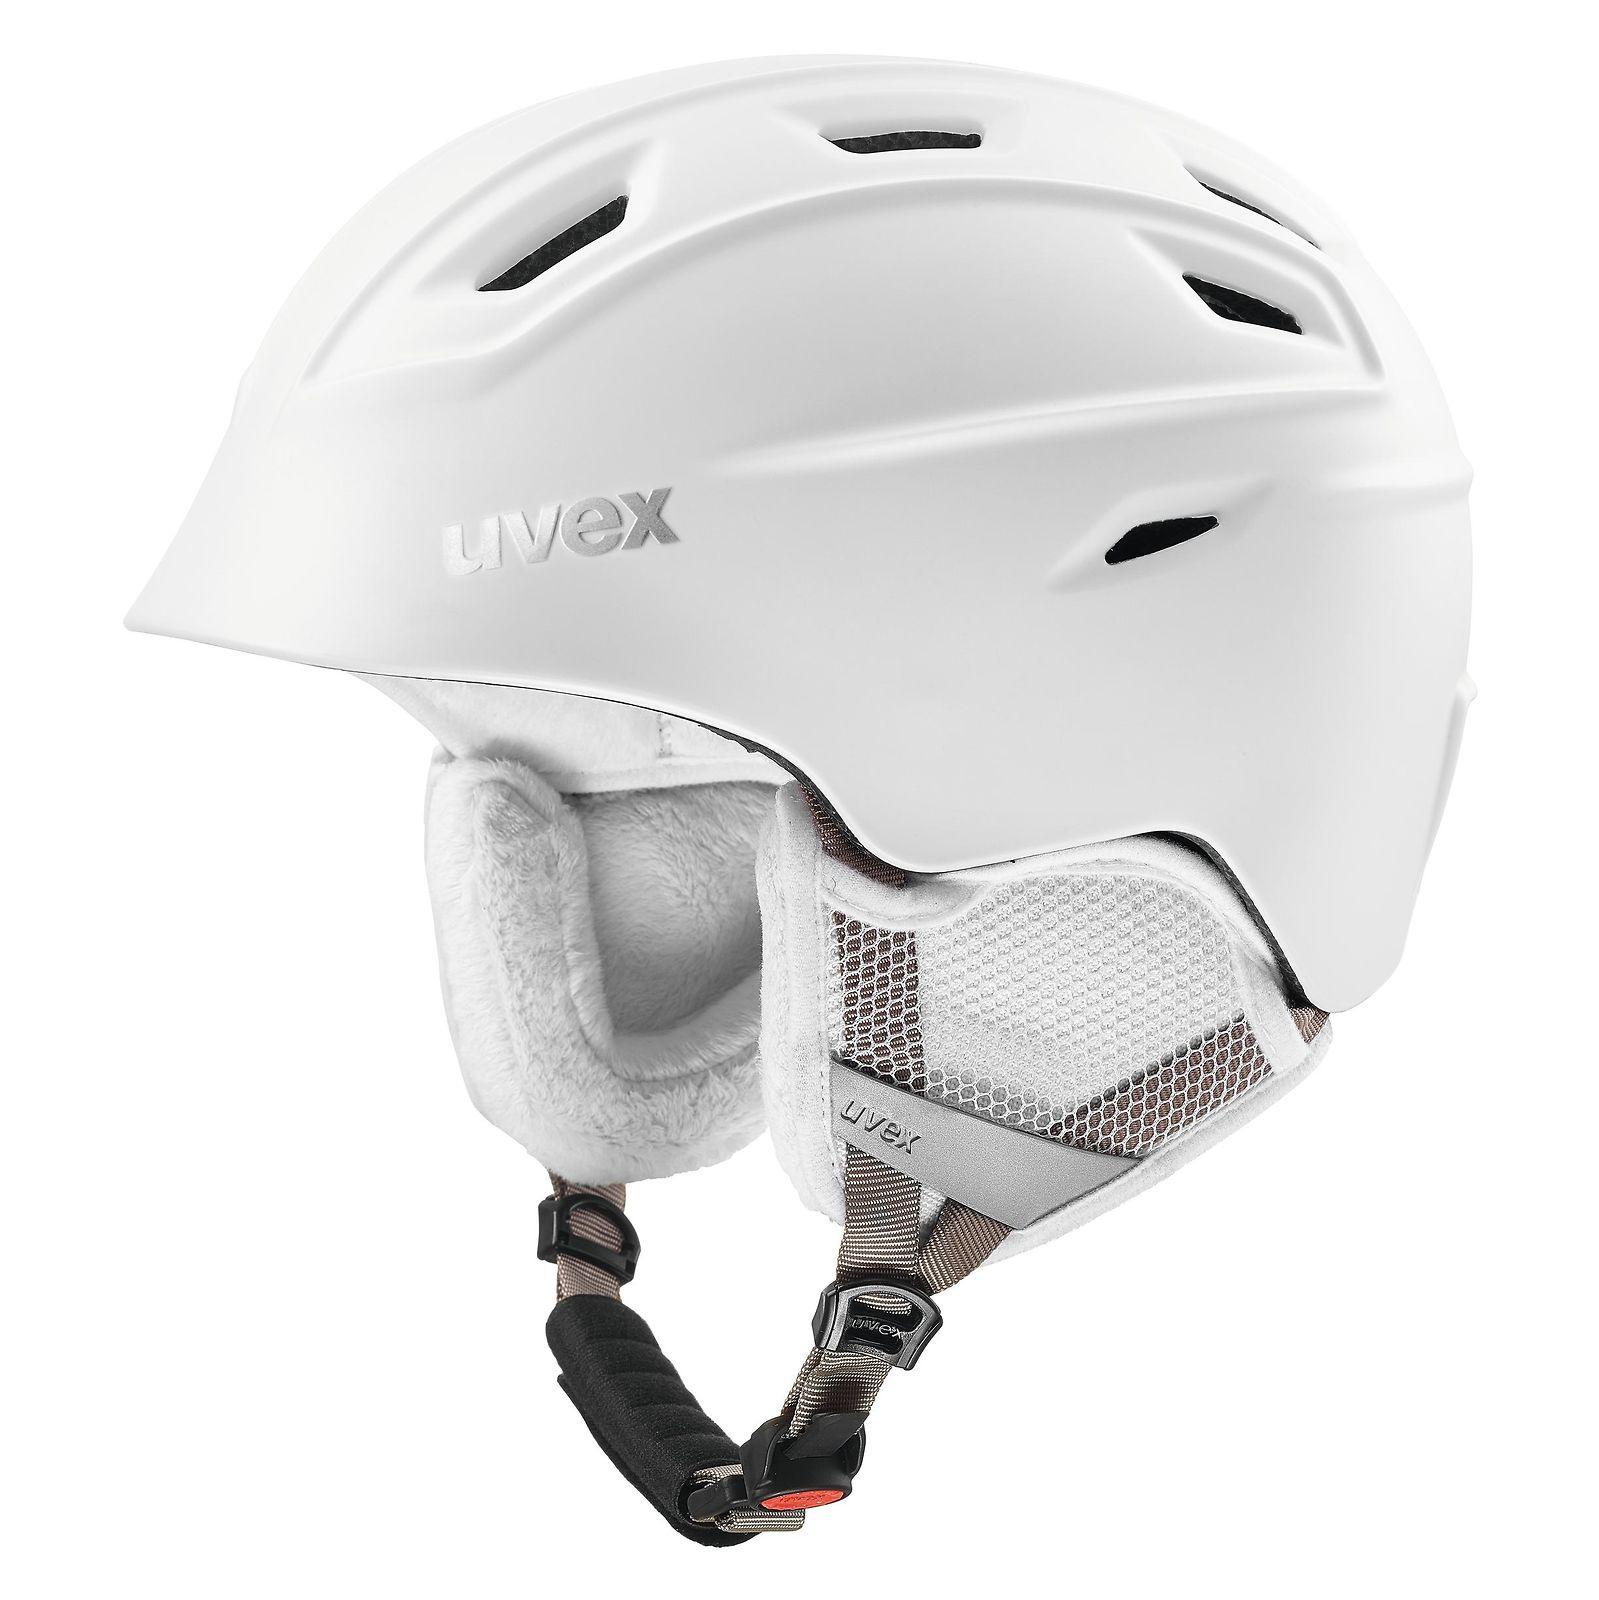 Kask narciarski Uvex Fierce 566225